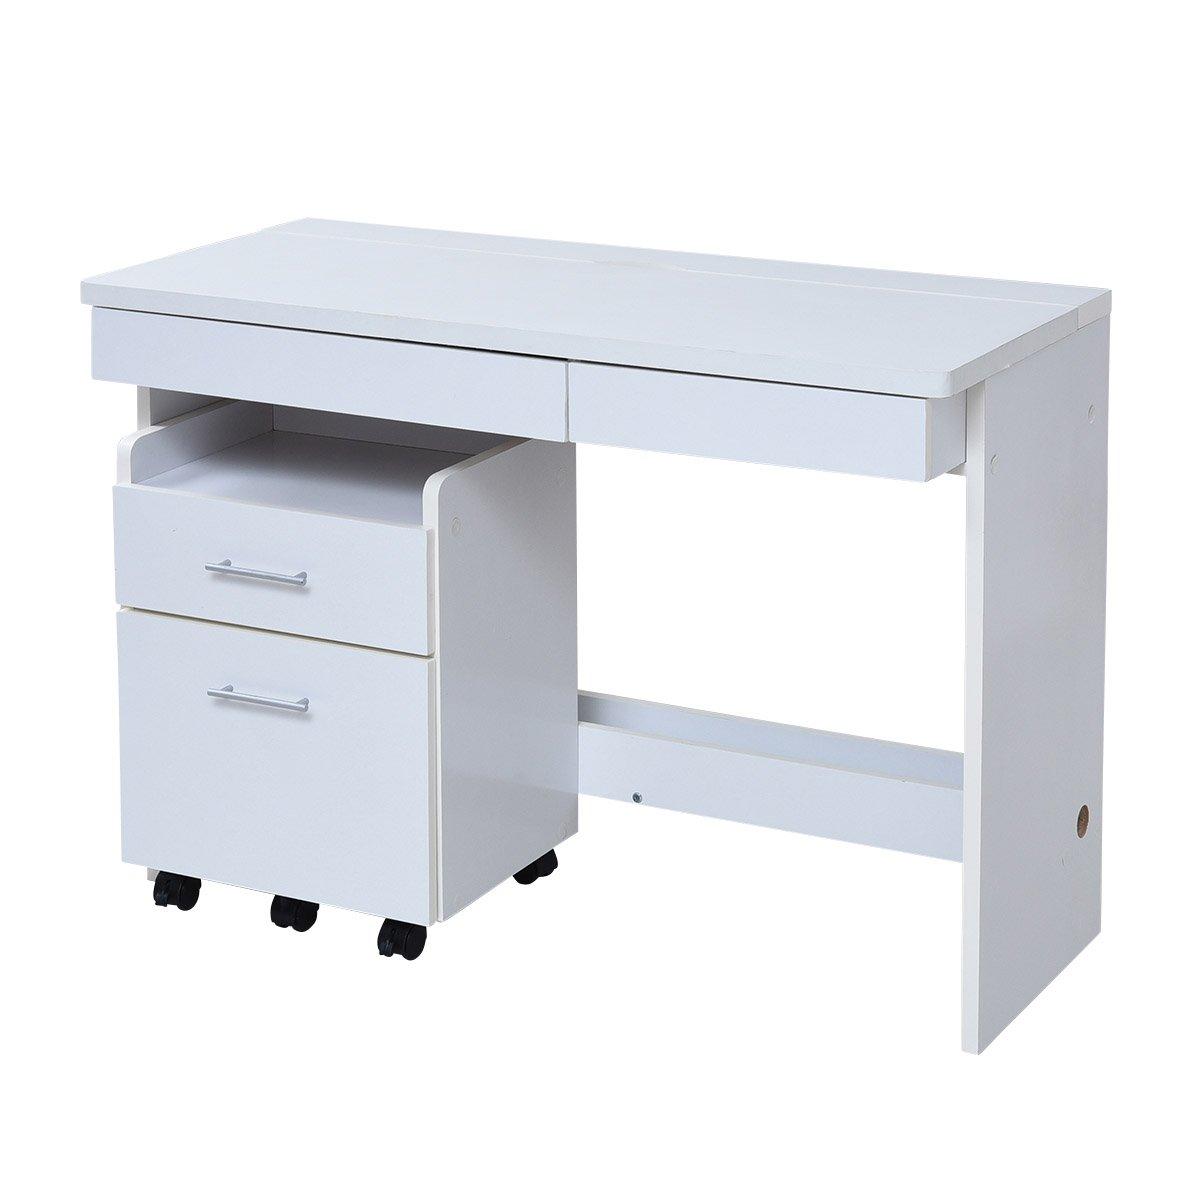 JKプラン デスク ワークデスク チェスト 2点セット すっきり 配線 収納 PCデスク パソコンデスク ハイタイプ 幅100 シンプル SOHO 木製 ホワイト 白 SGT-0125-WH B078YRPPLPホワイト